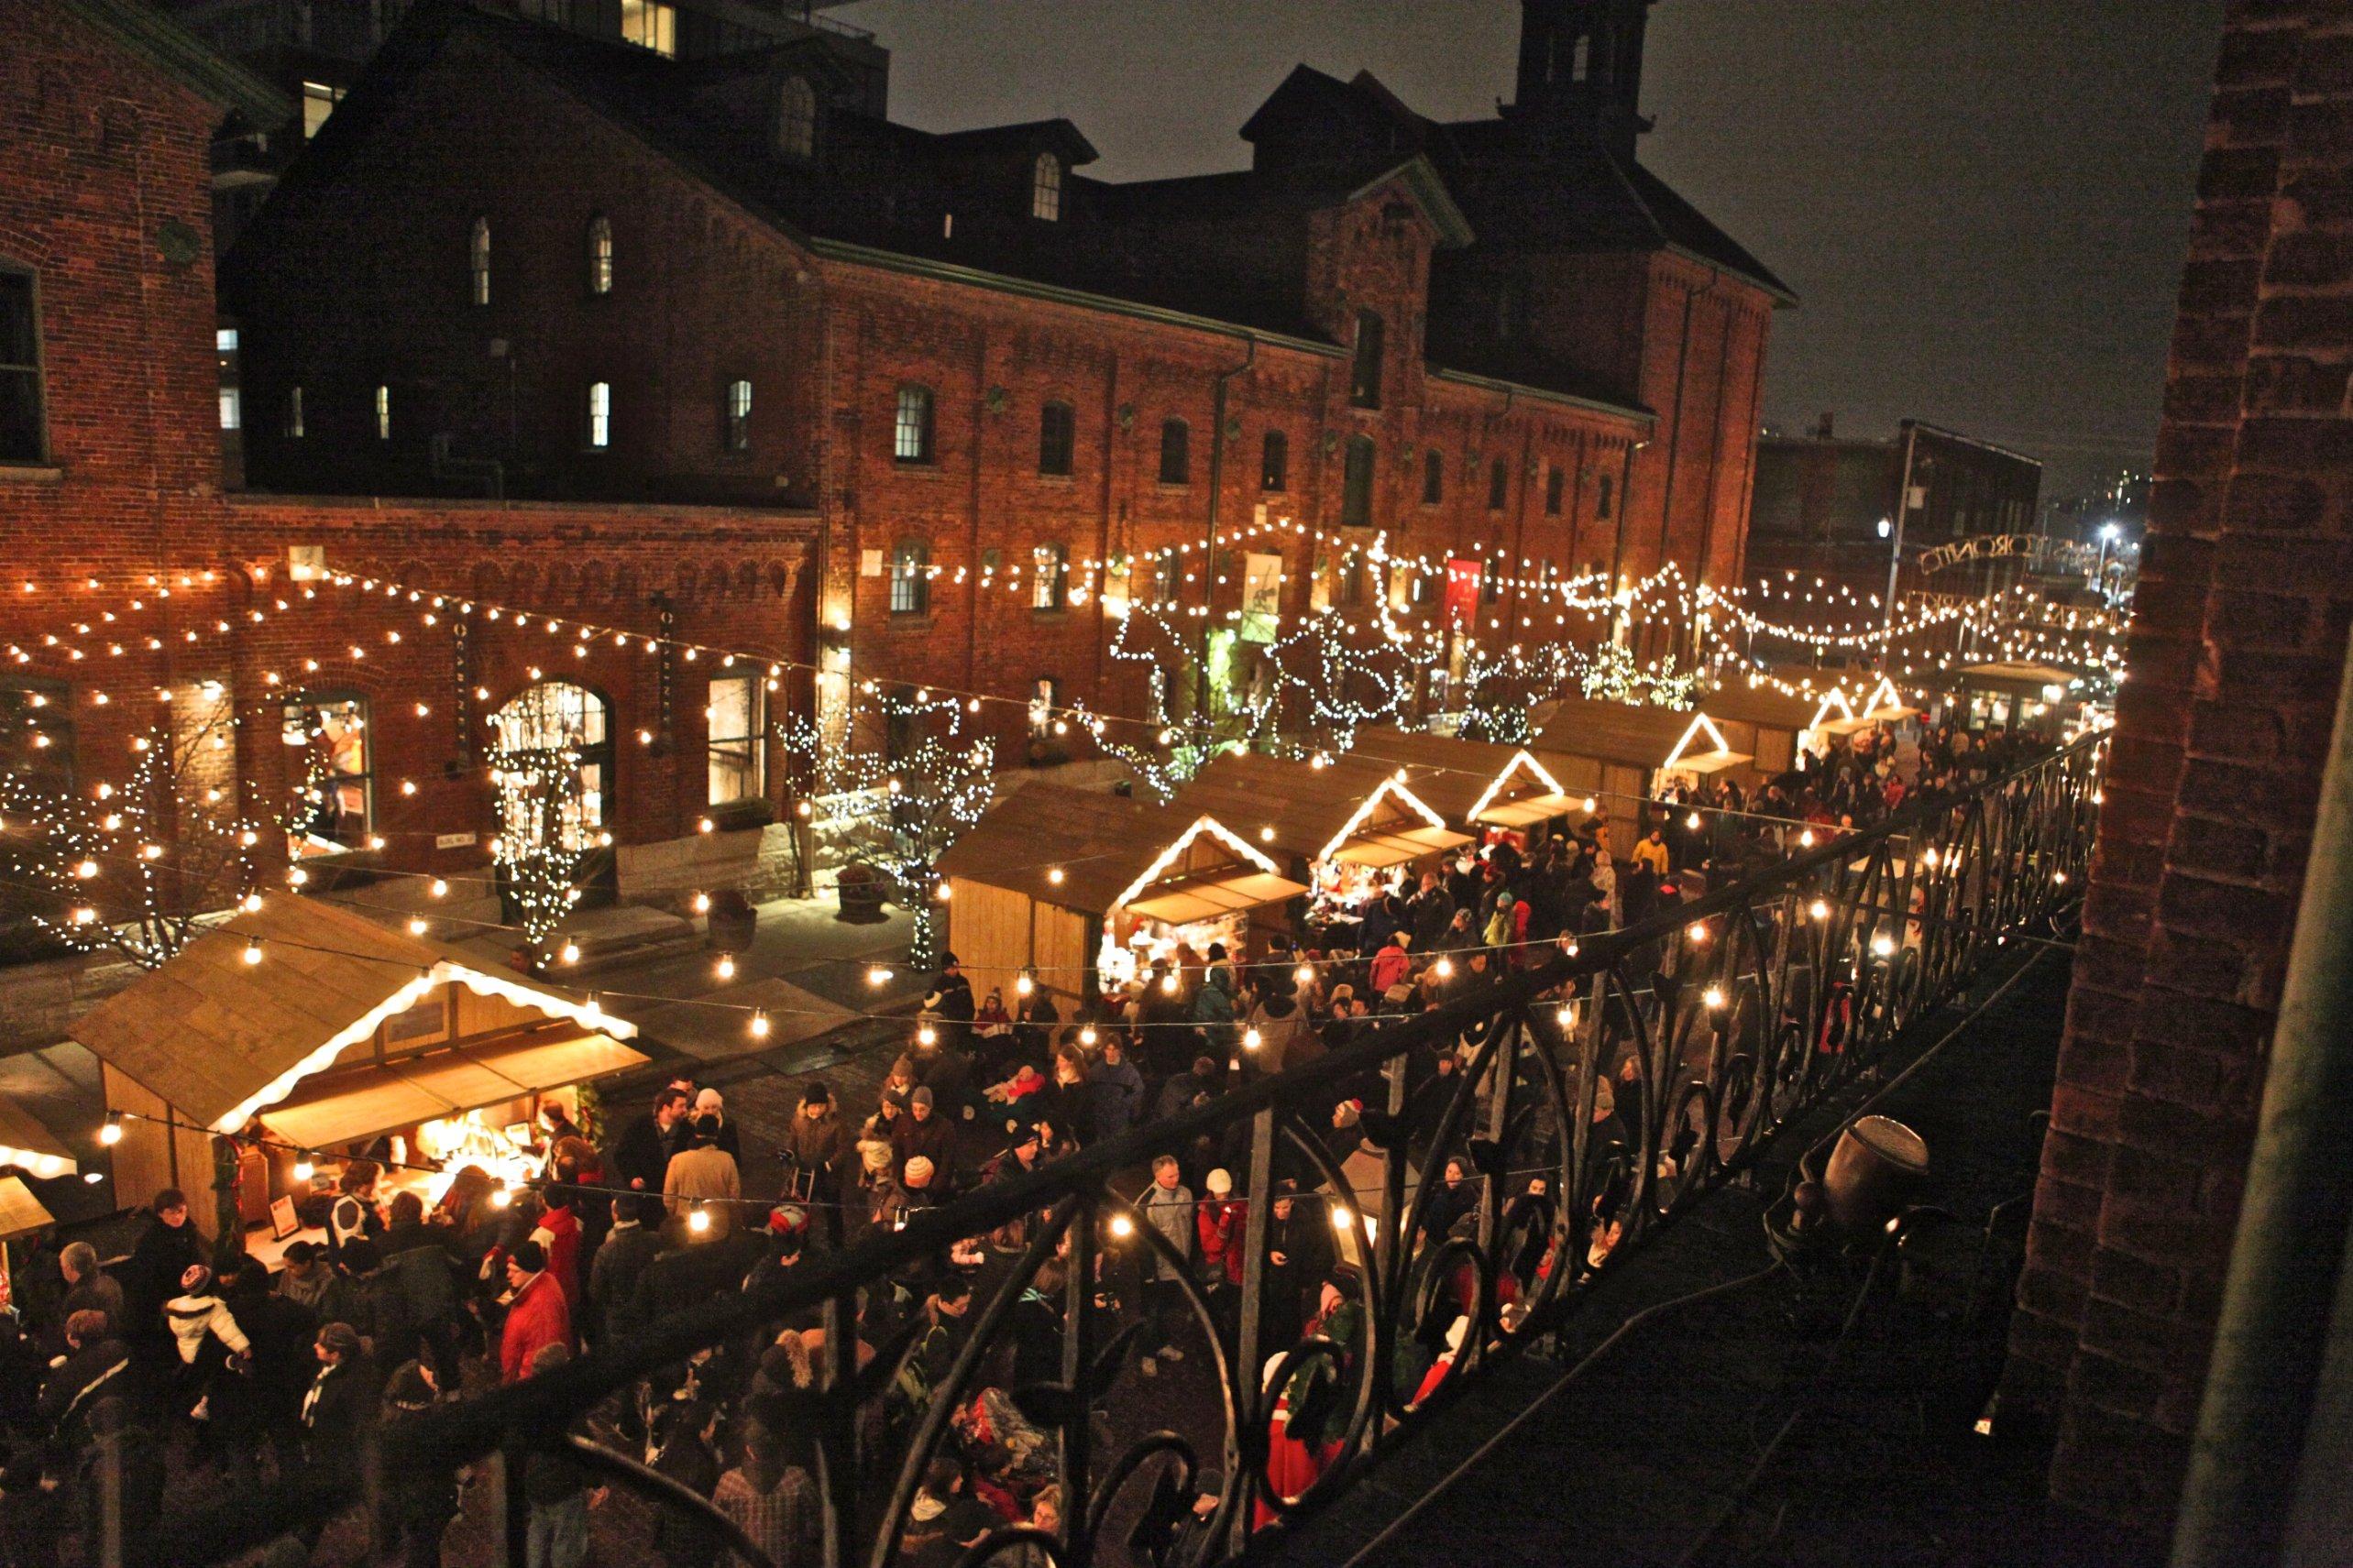 2020 Christmas Market At Mifflinburg Pa 9 German style Christmas markets in North America | CNN Travel